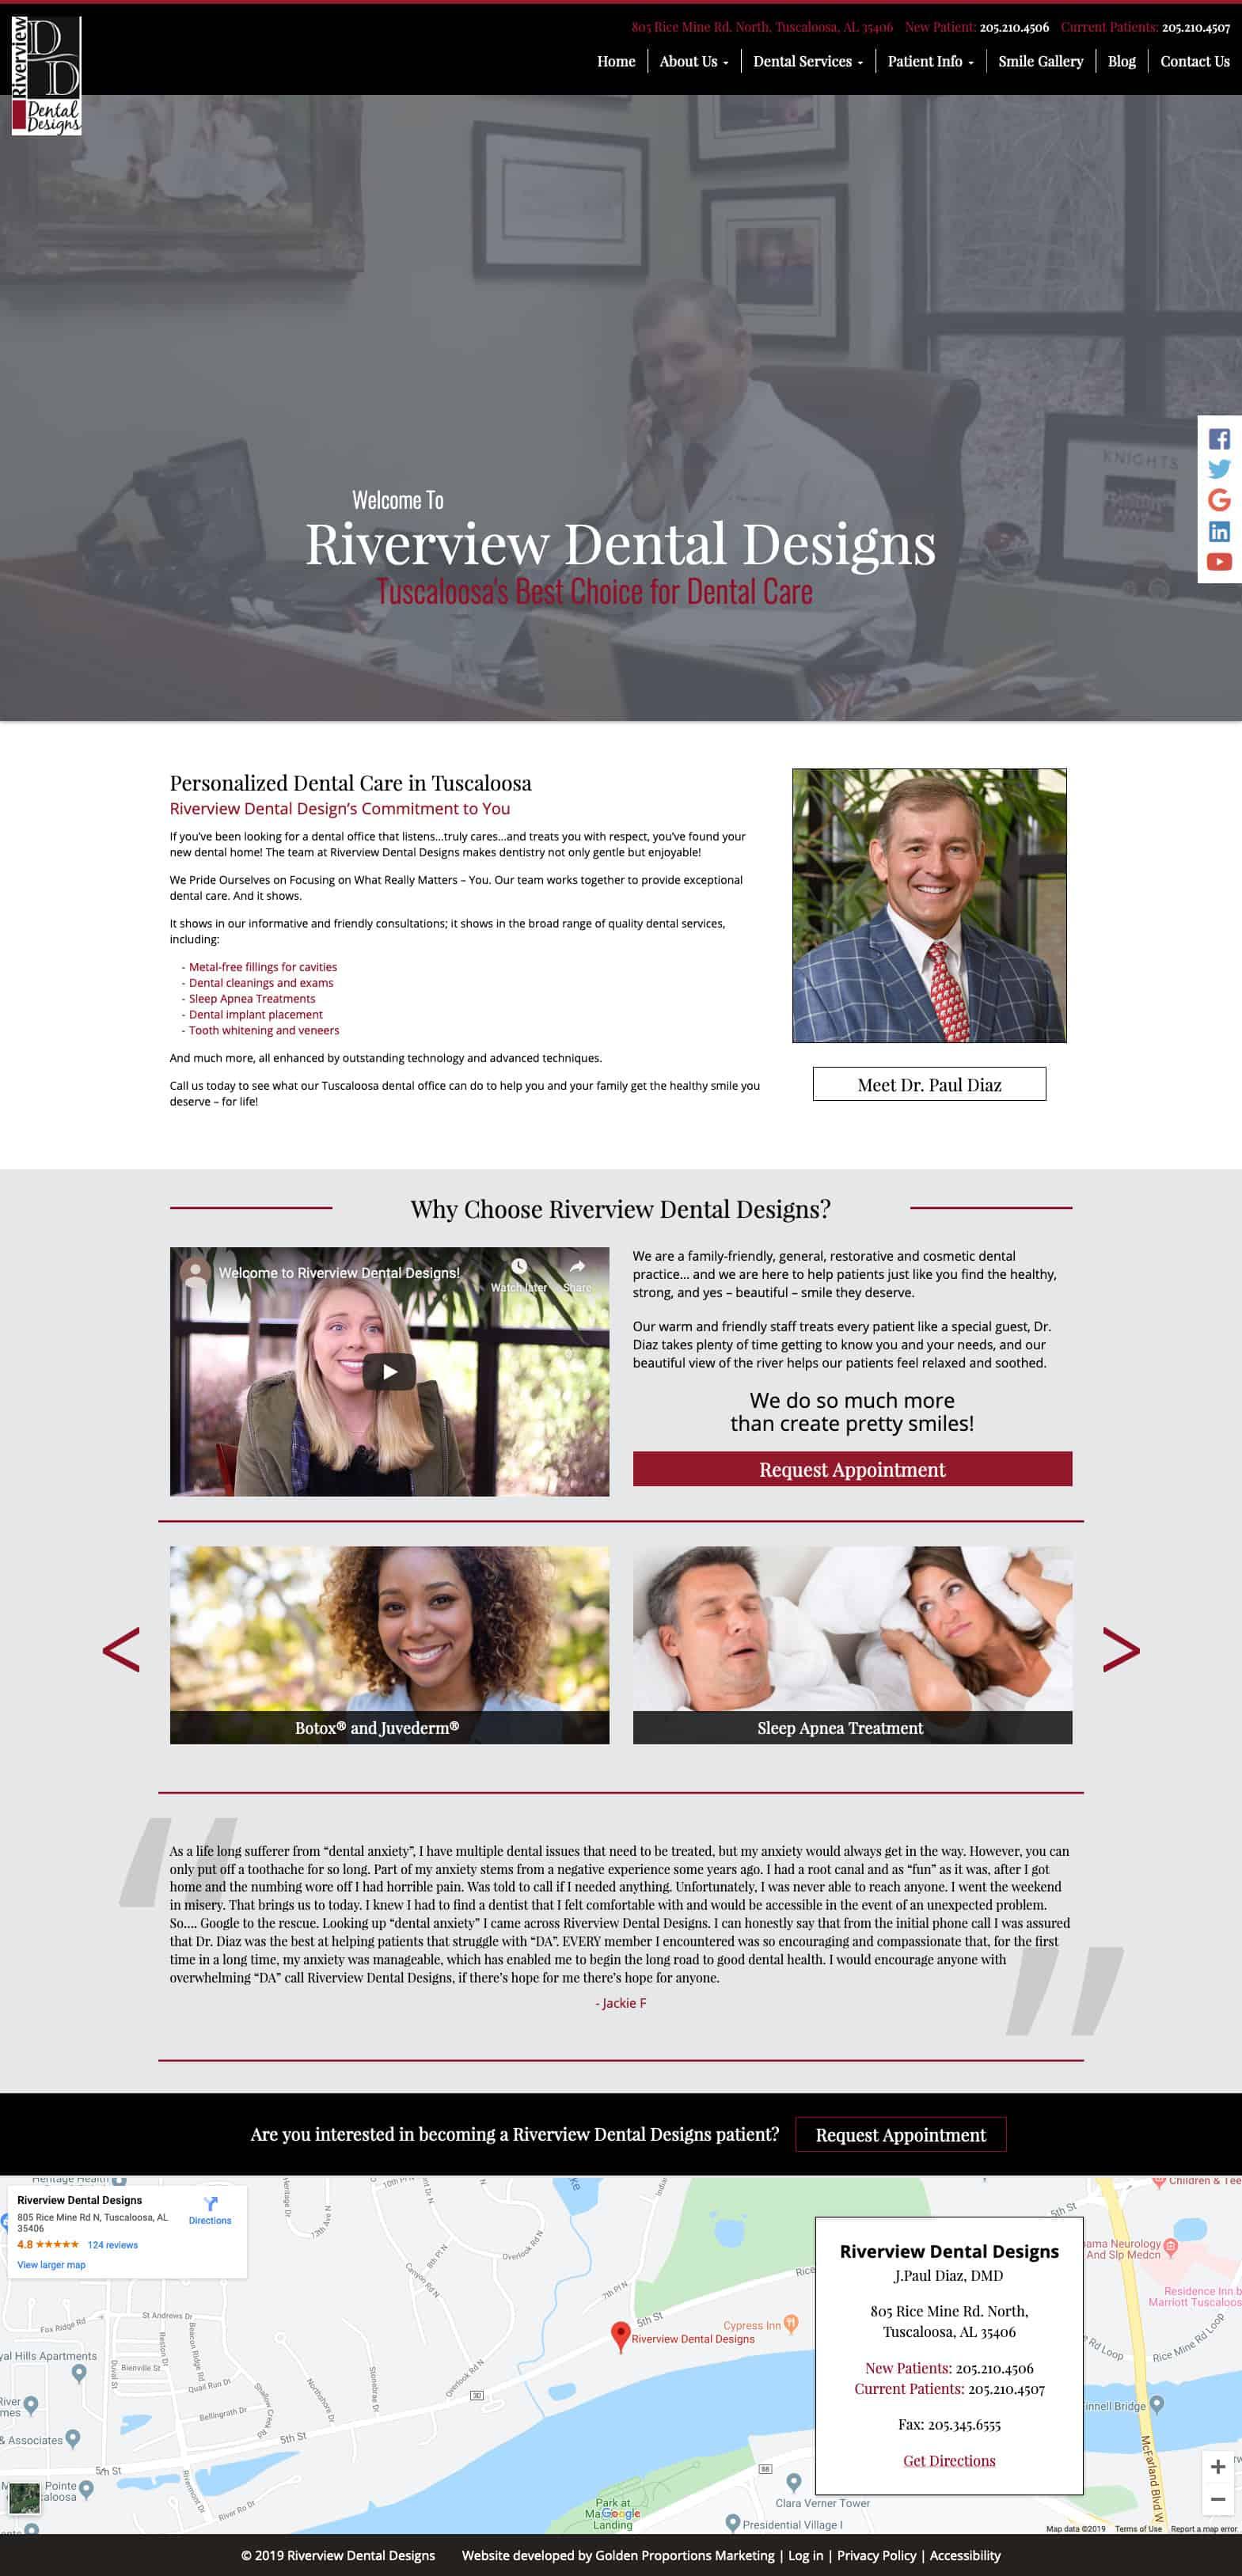 Riverview Dental Designs